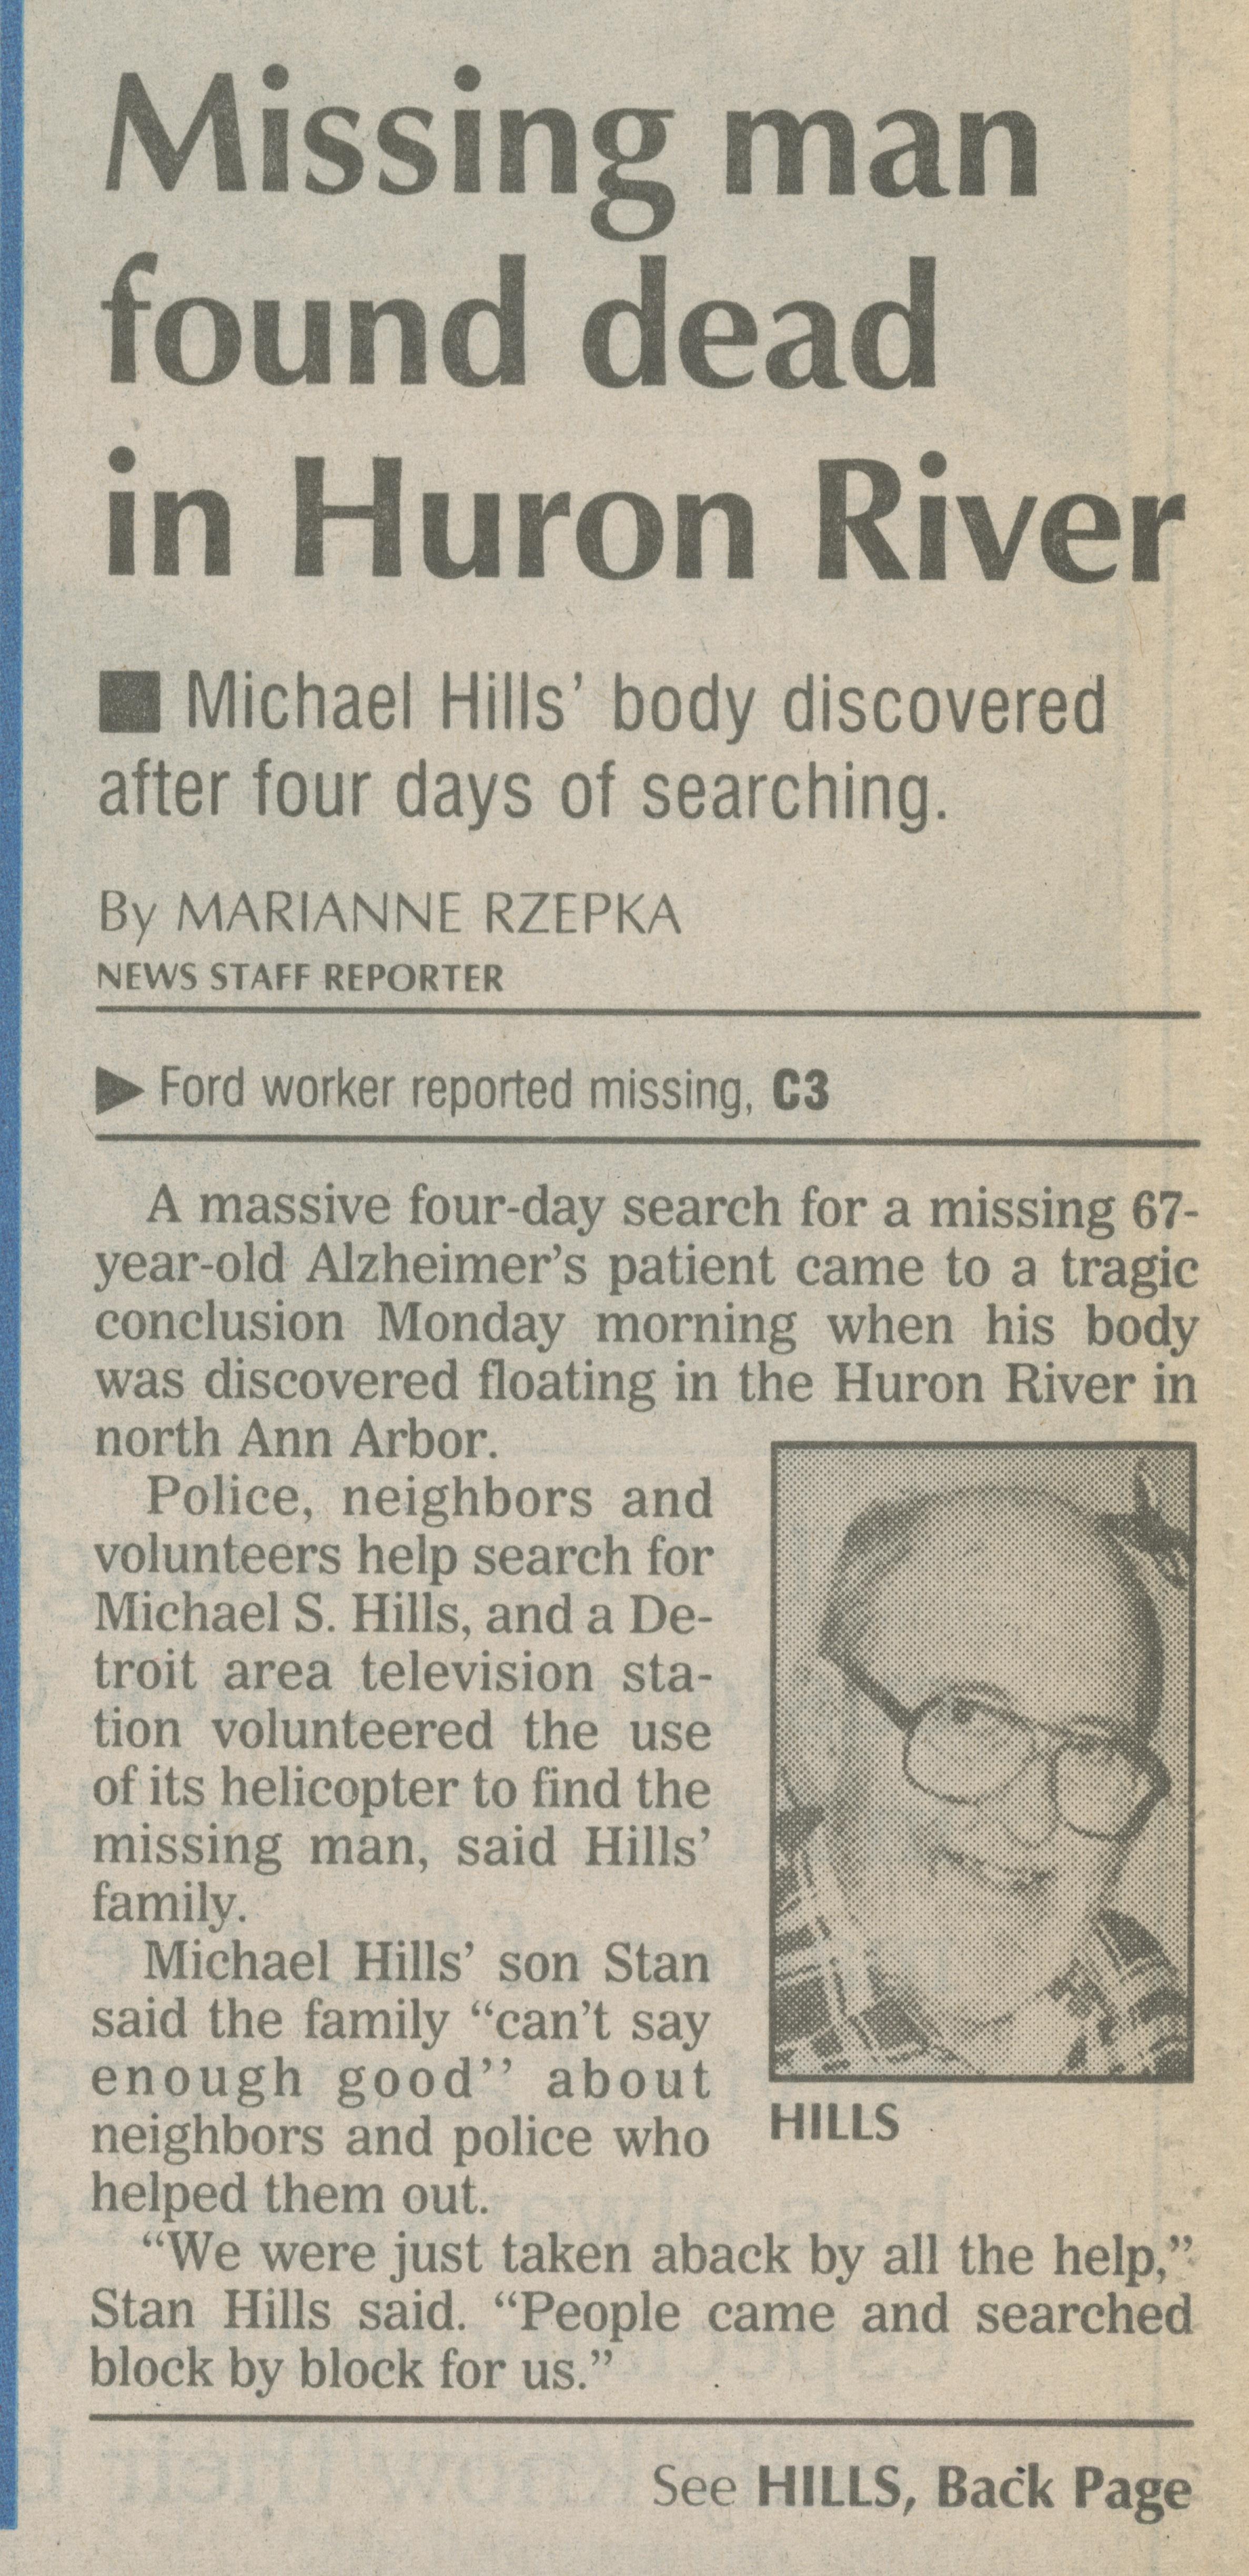 Missing man found dead in Huron River | Ann Arbor District